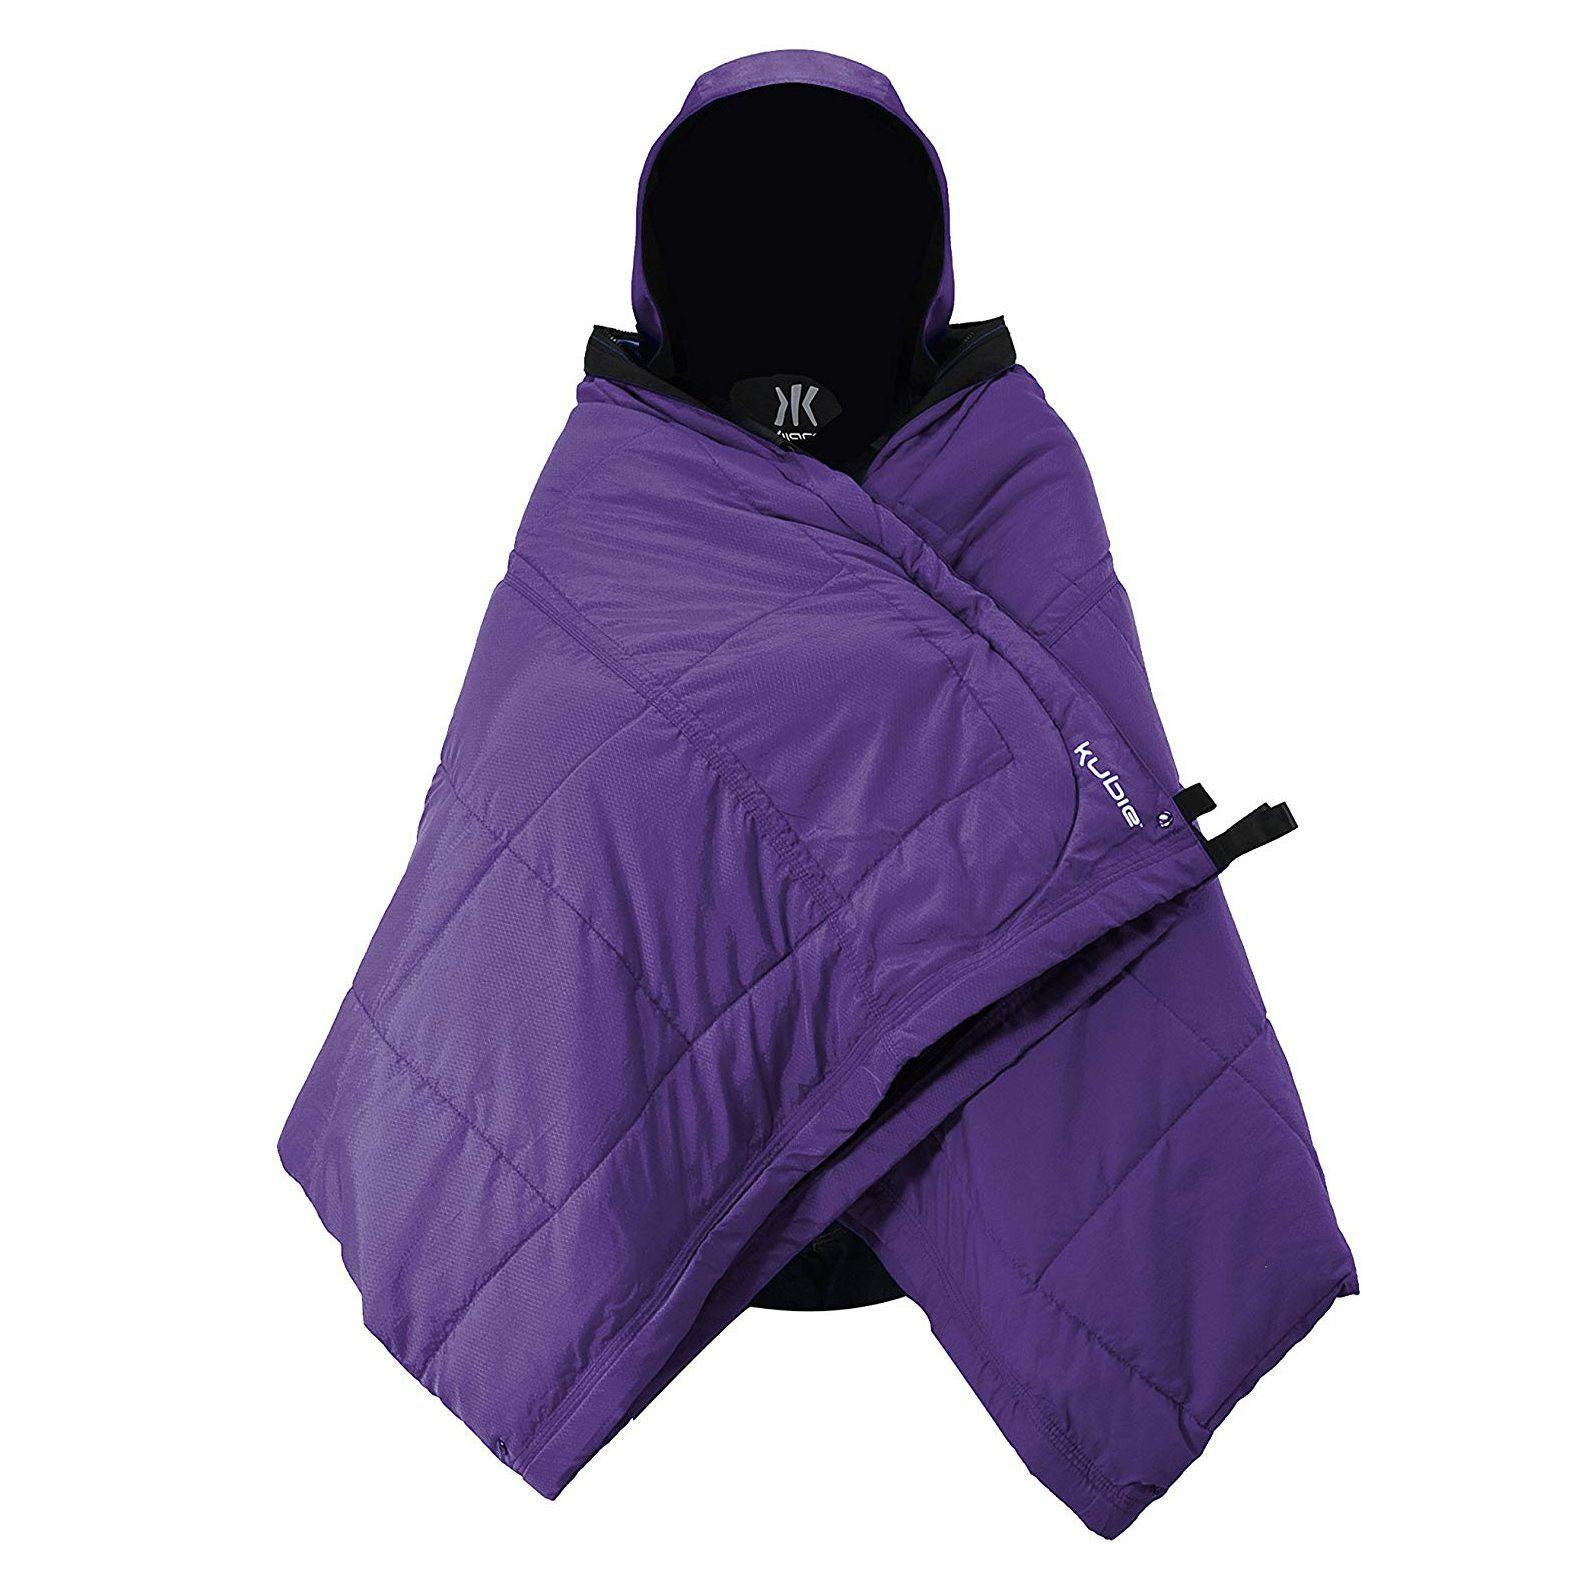 versatile outdoor poncho